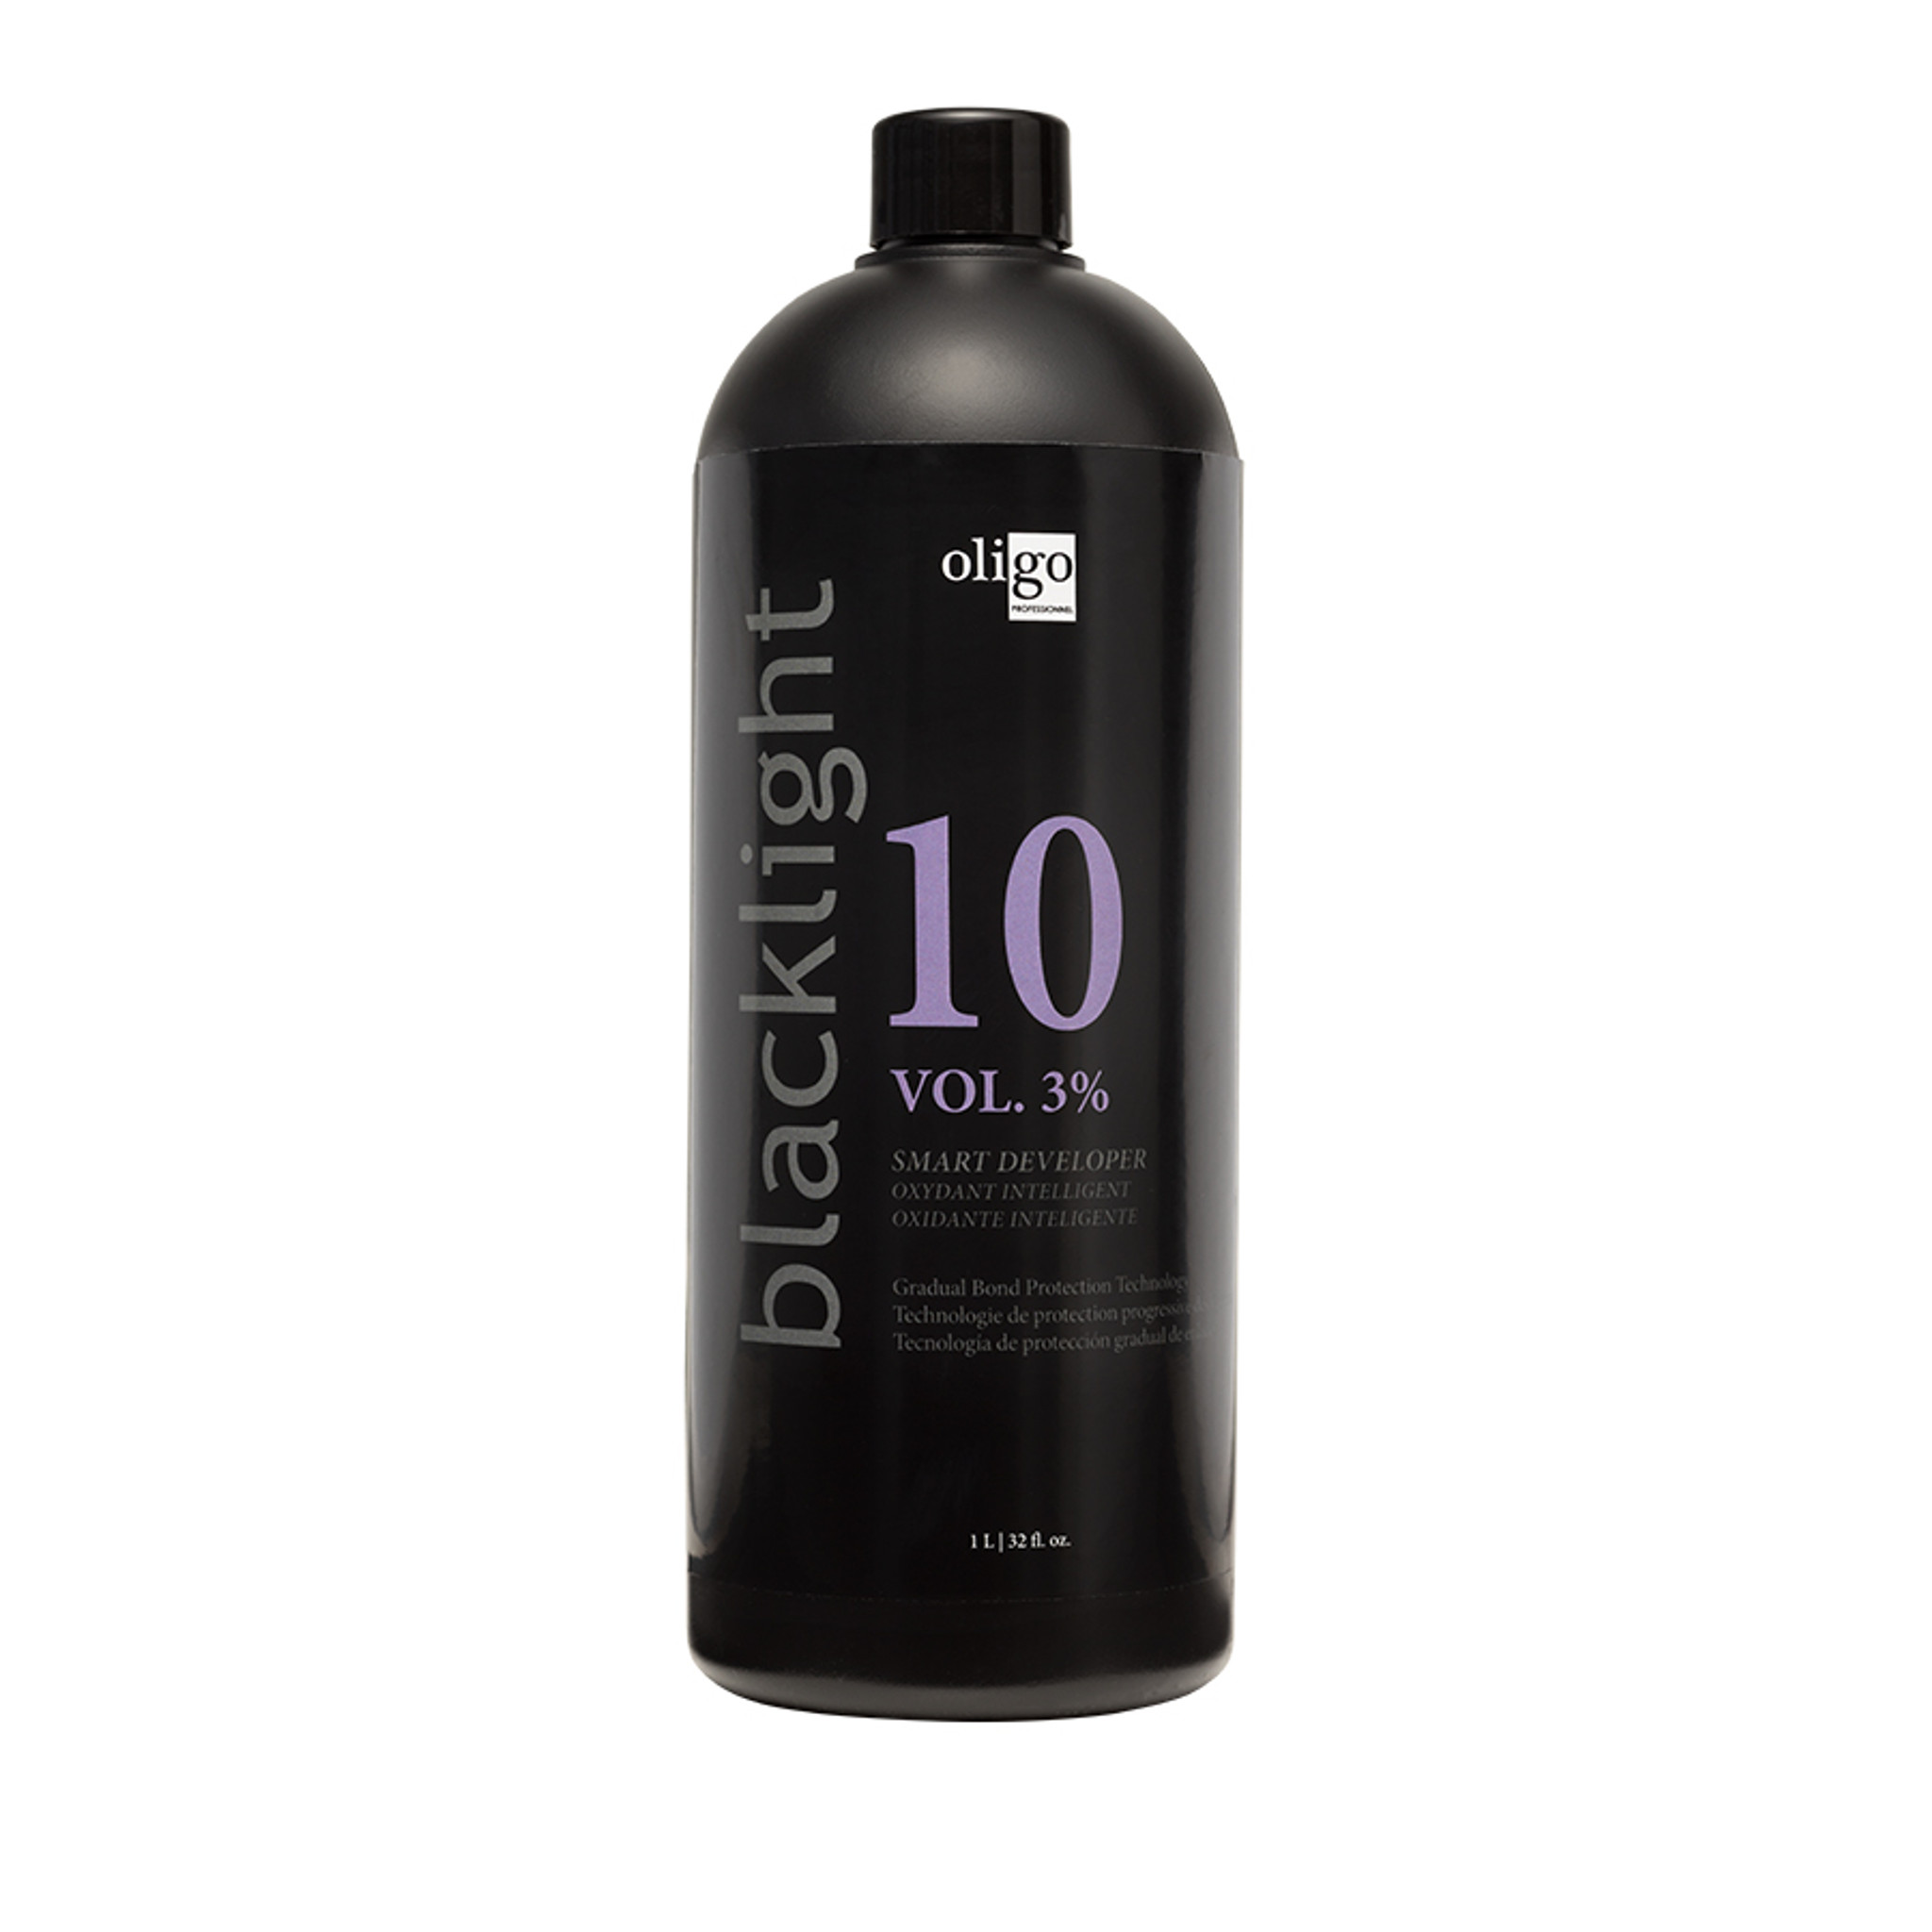 Oligo Pro Blacklight 10 Vol (3%) Smart Developer 1lt by Shop Salon Support - official distributor of Oligo in Australia, Hair & Barber Barbershop Trade Wholesale Hairdressing Supplies Melbourne Australia